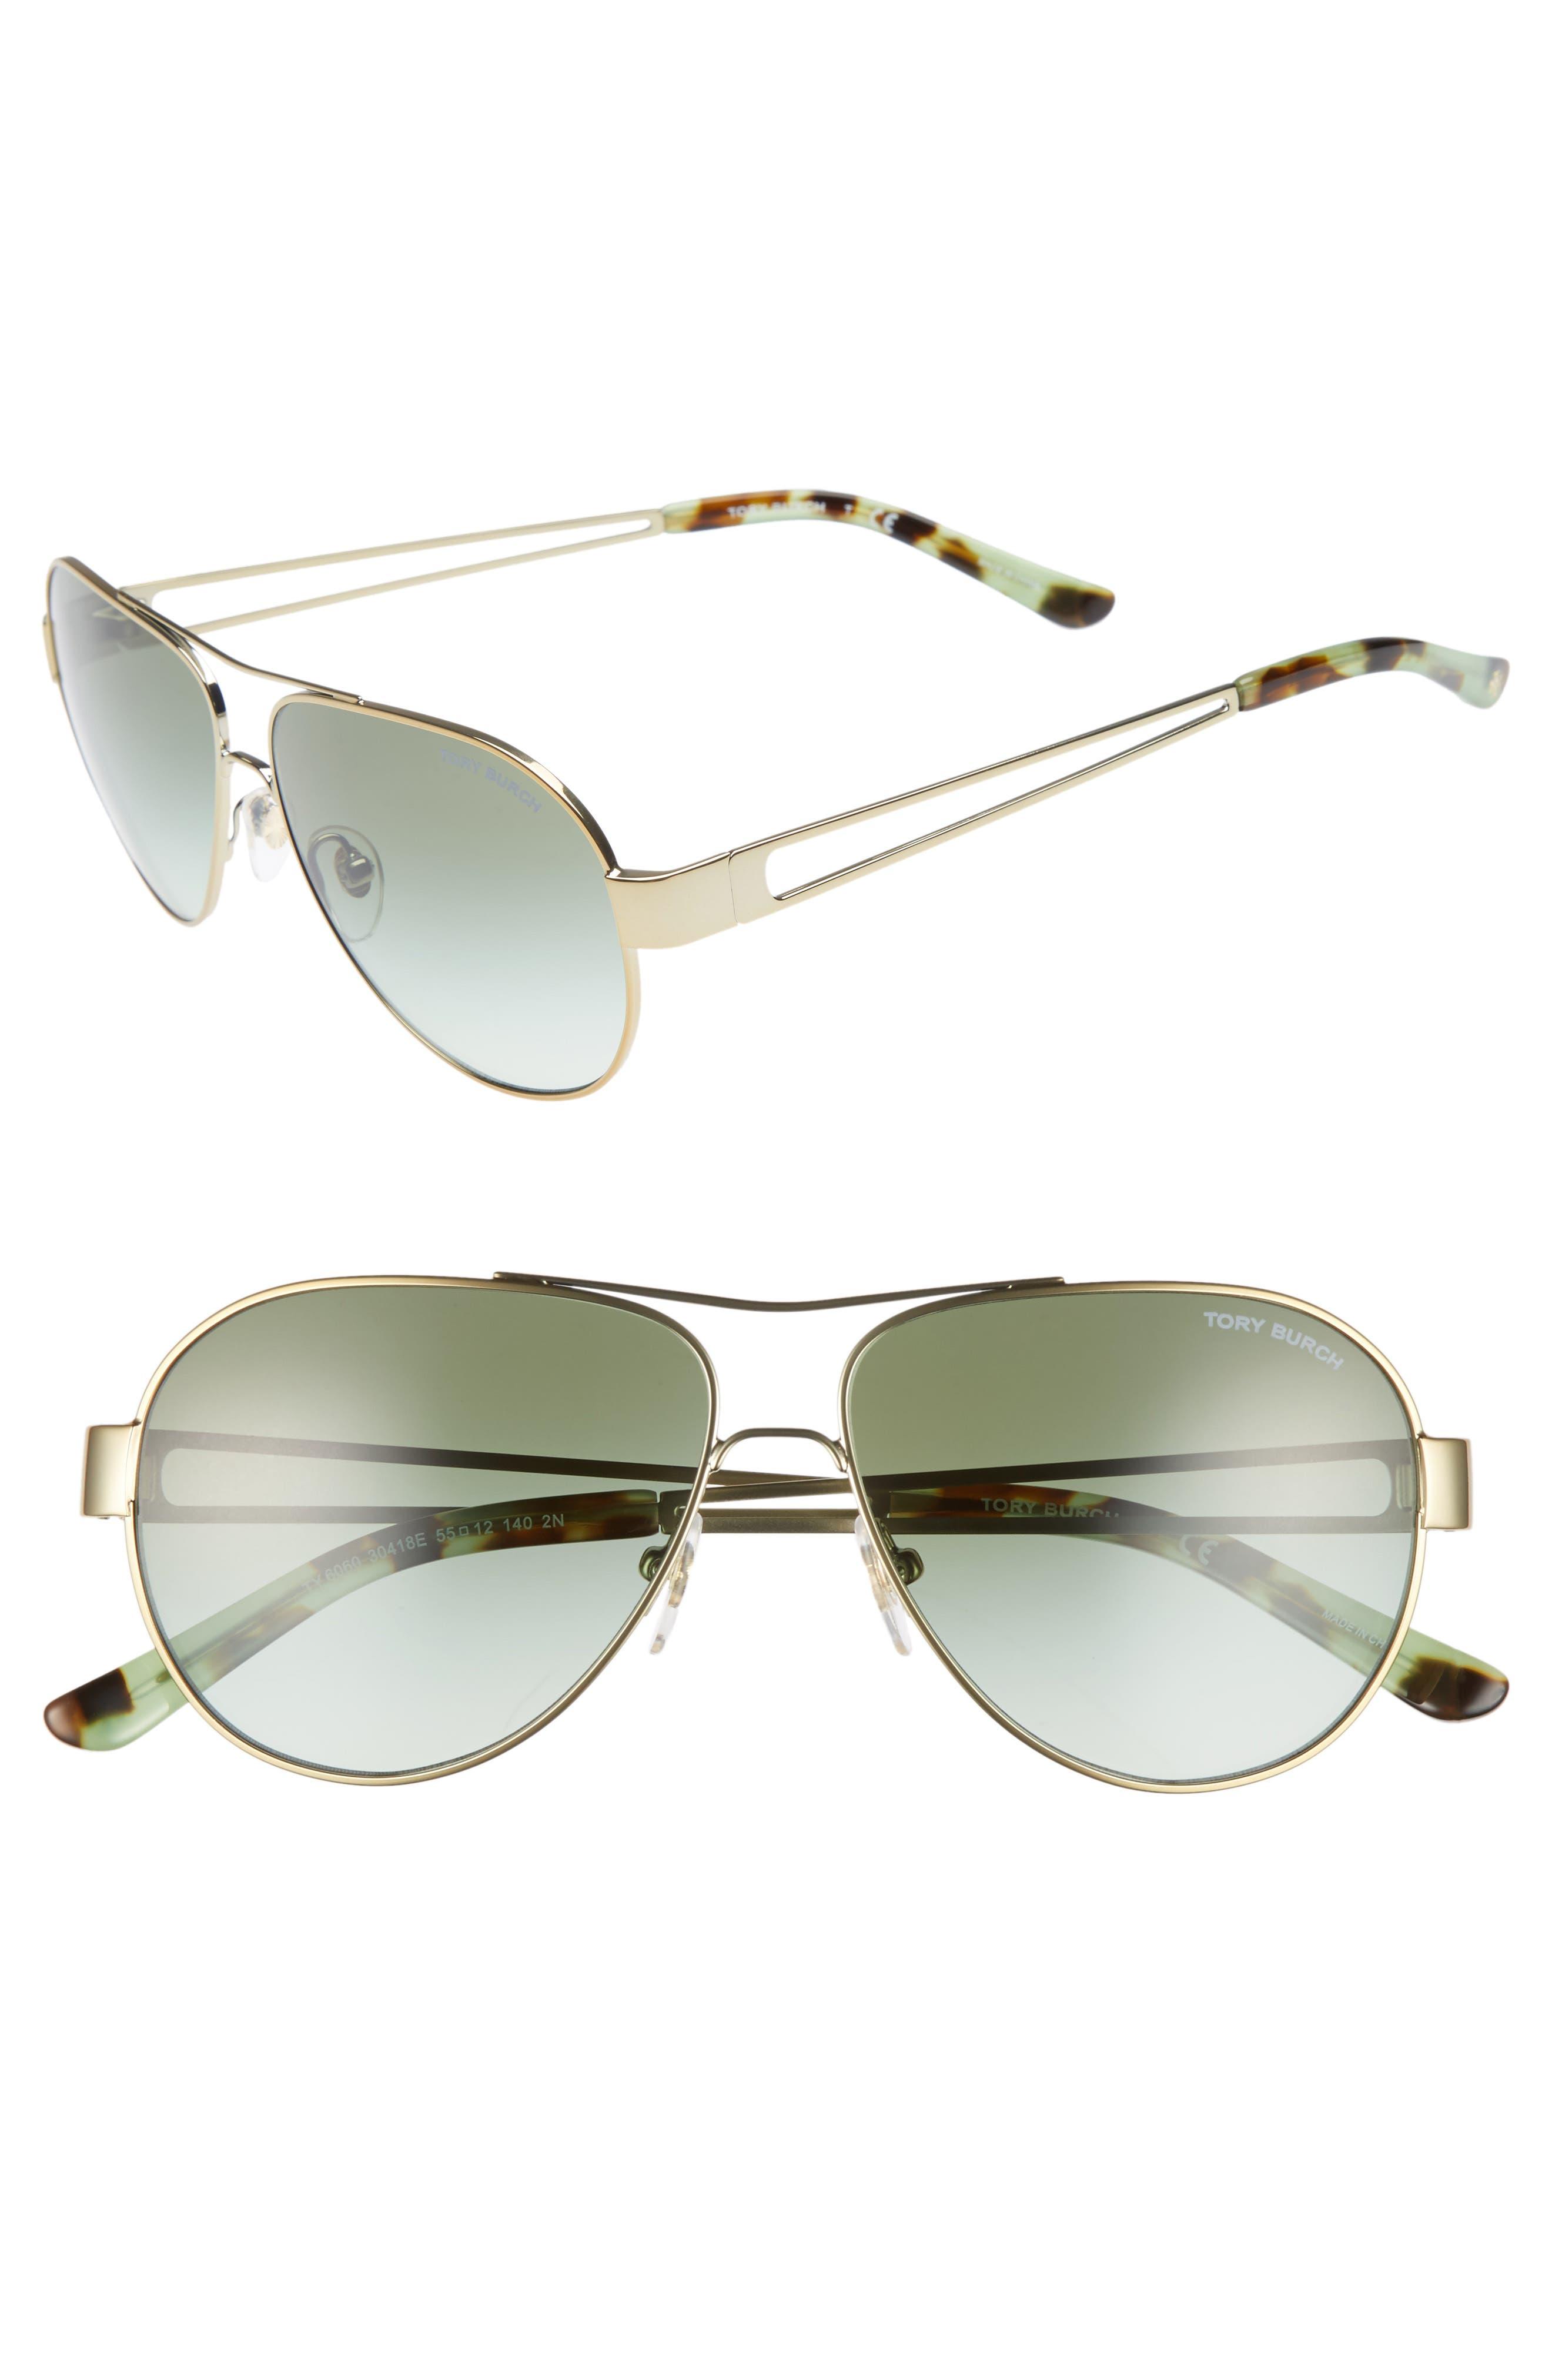 55mm Polarized Aviator Sunglasses,                             Main thumbnail 1, color,